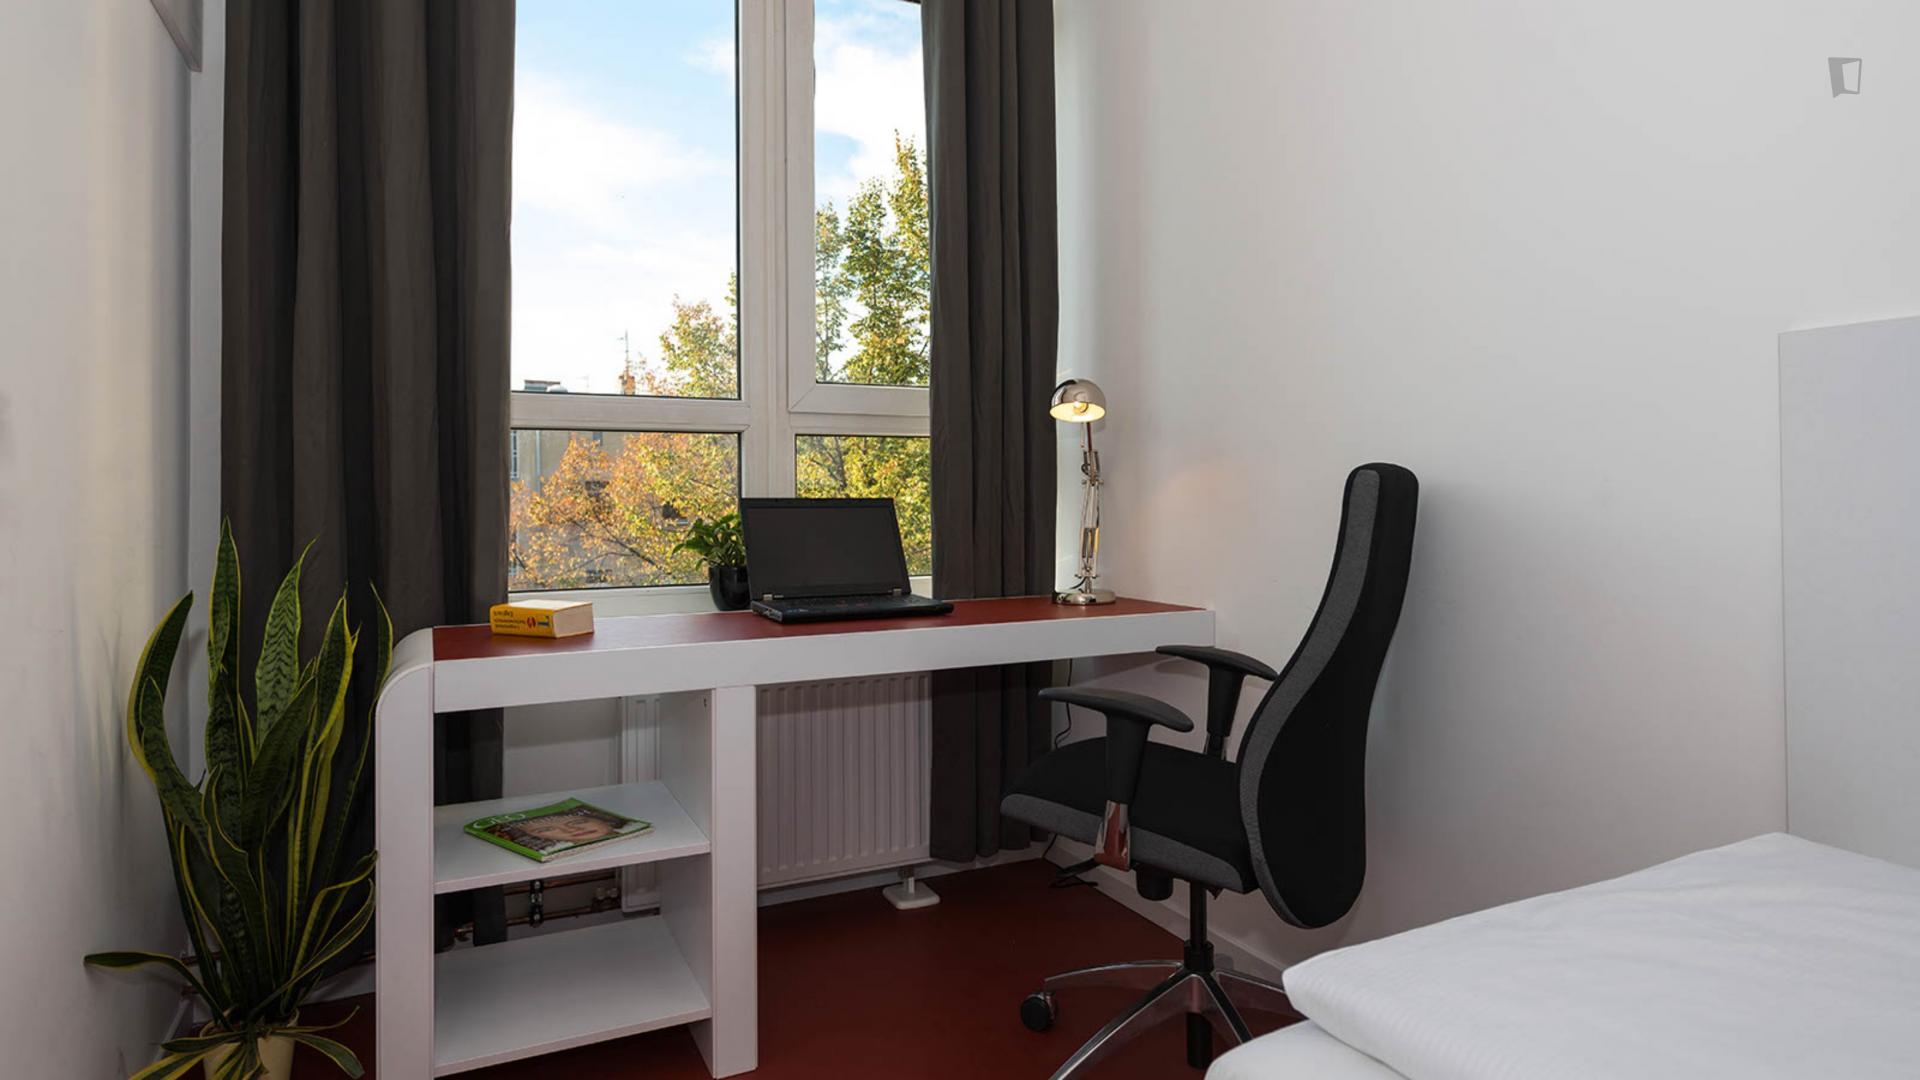 Cuvry - Entry ready studio in Berlin